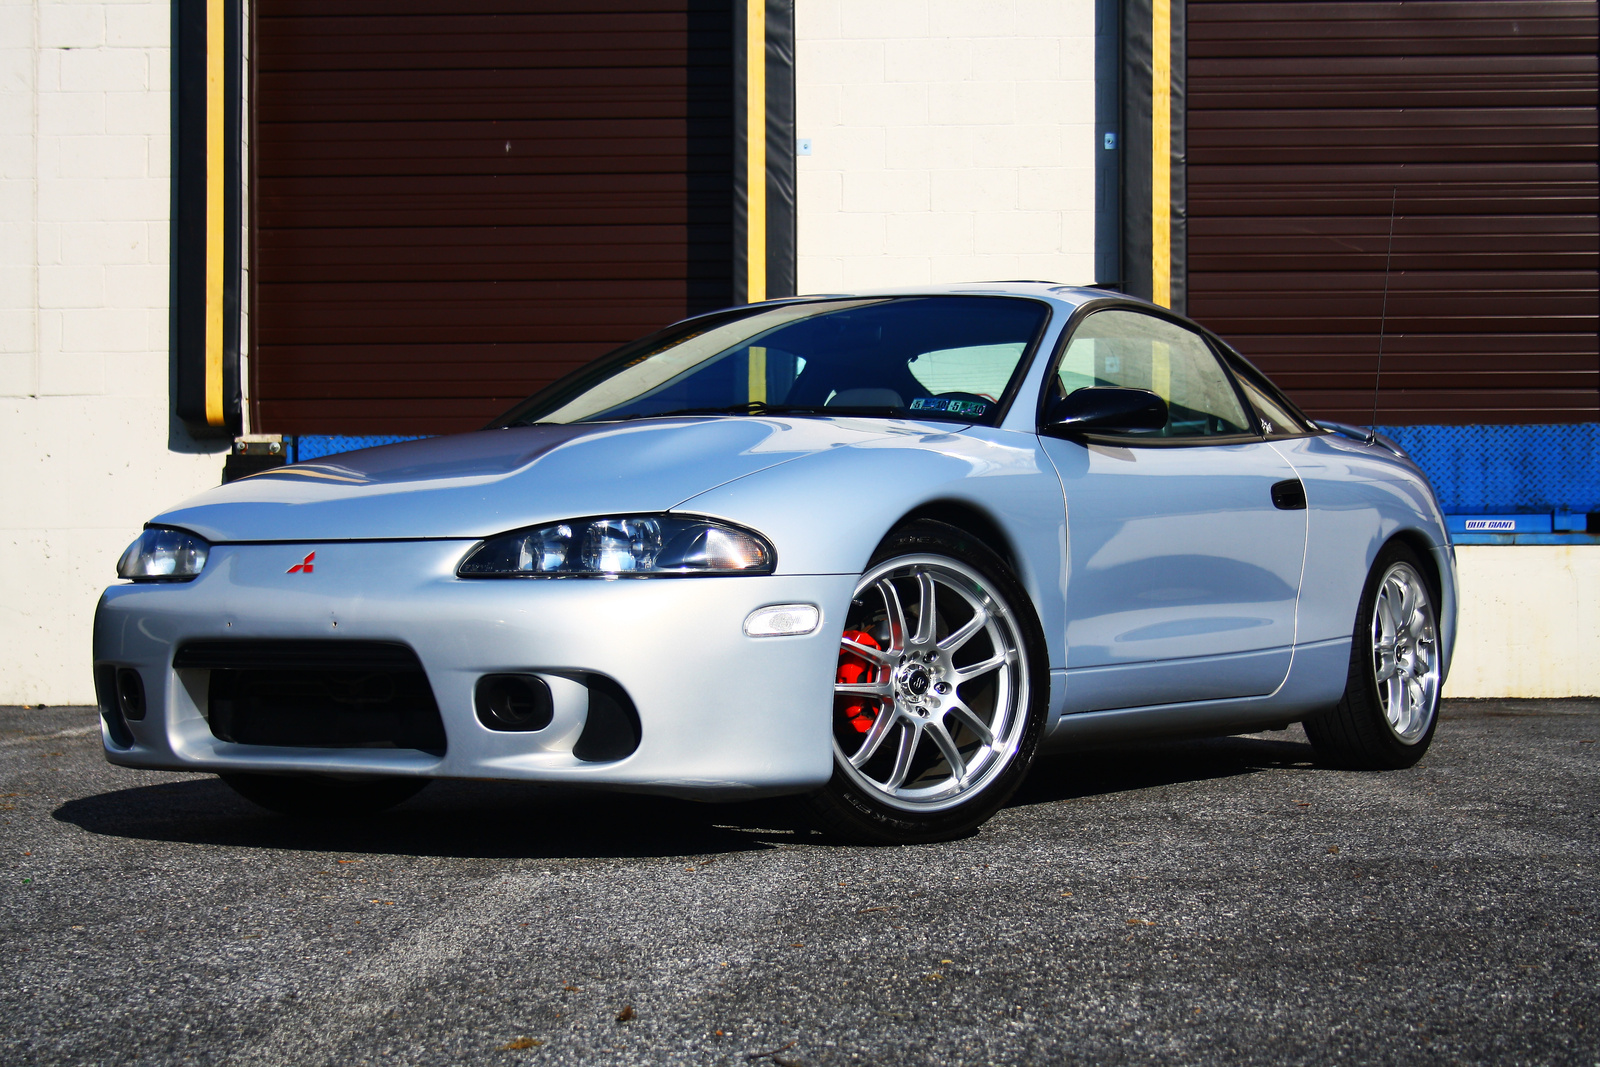 1999 Mitsubishi Eclipse RS, 1999 Mitsubishi Eclipse 2 Dr RS Hatchback ...